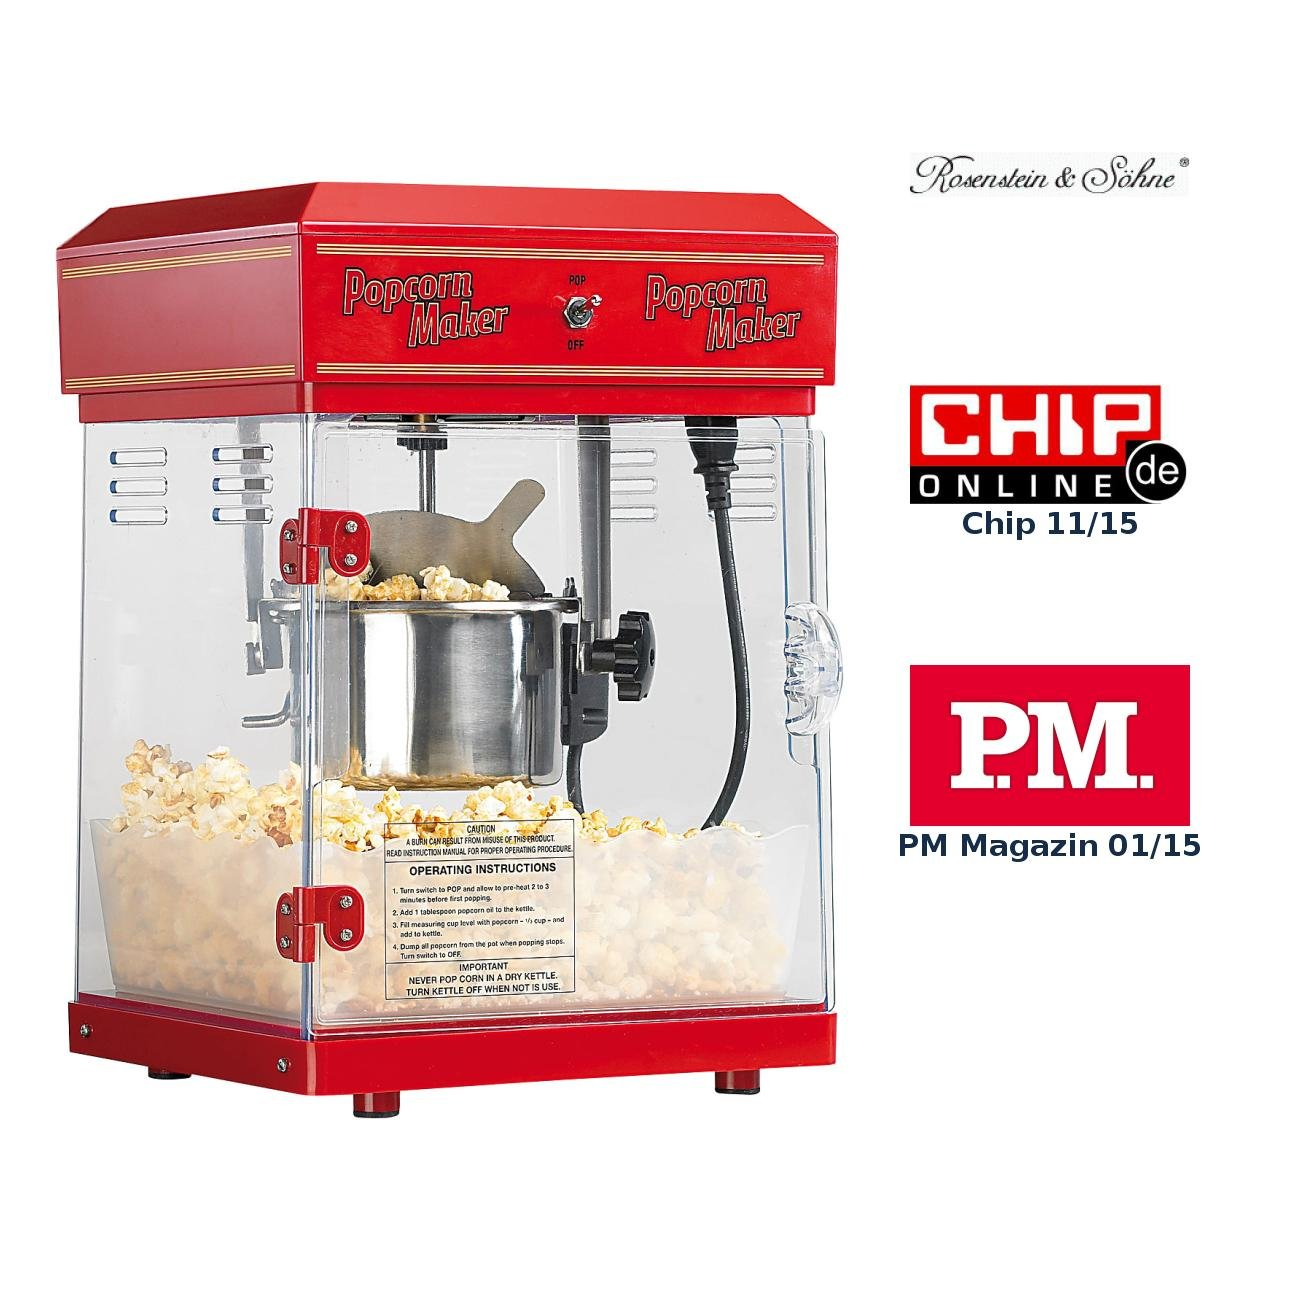 Werbung: Popcorn Maker - Retro Popcorn Maschine / Bild: Amazon.de